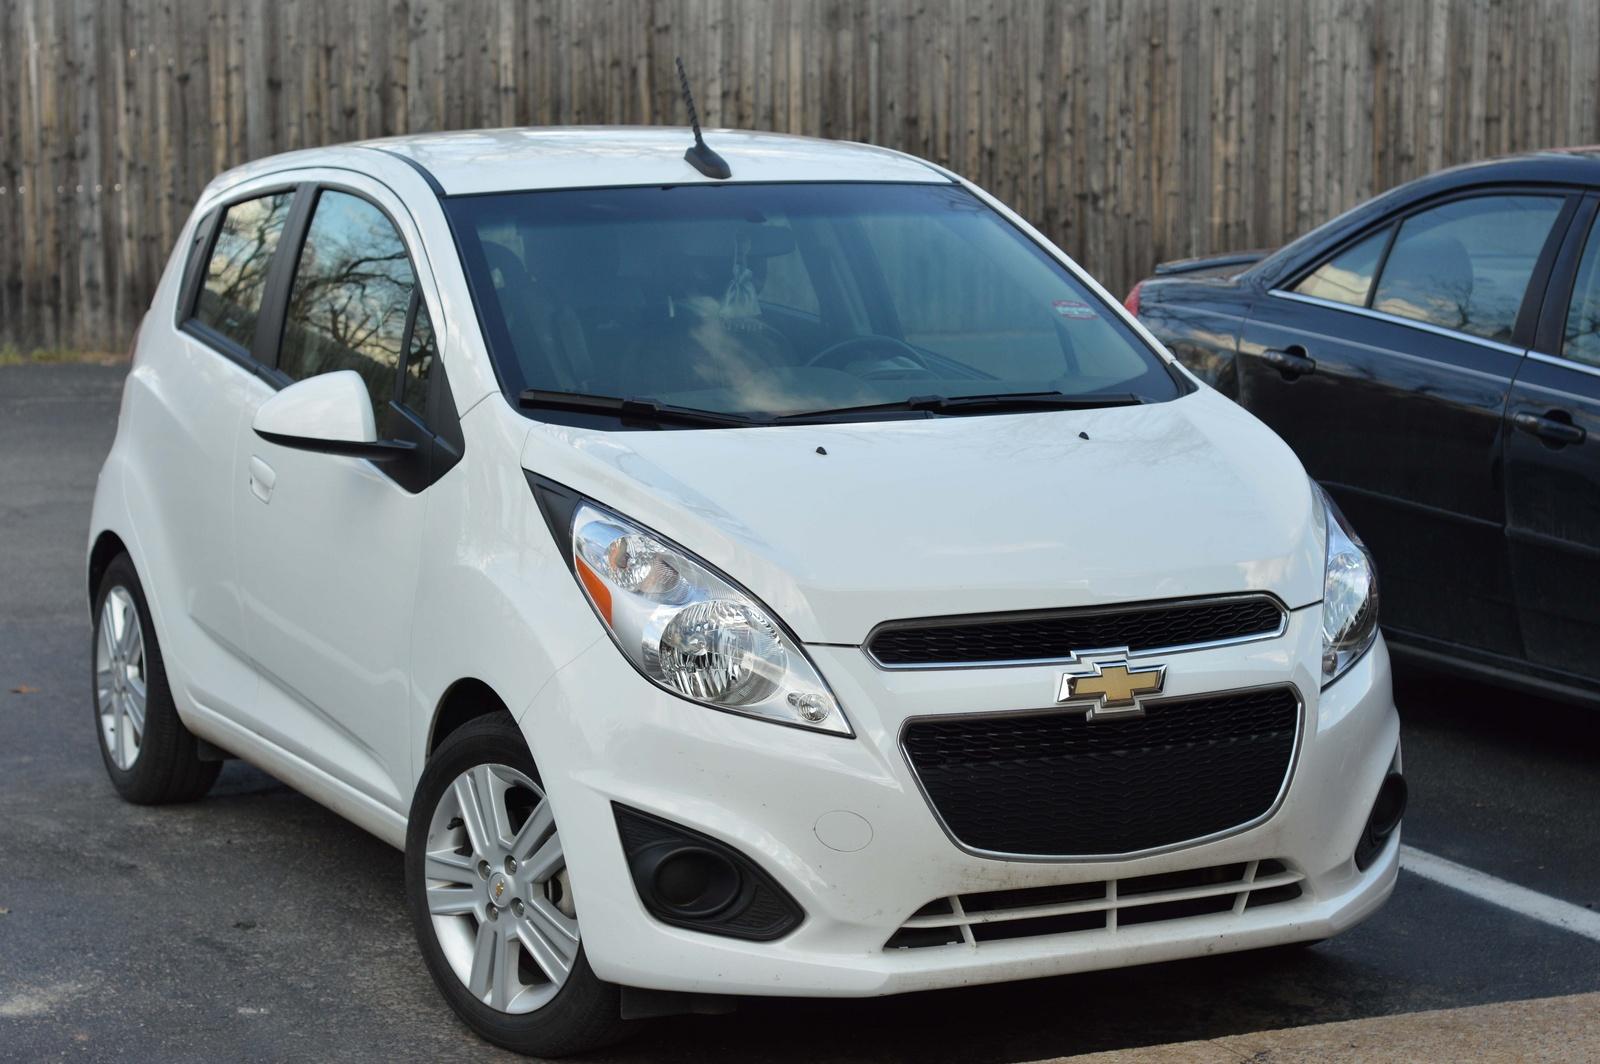 Nashville Il Car Dealers >> New 2014 Chevrolet Spark For Sale - CarGurus